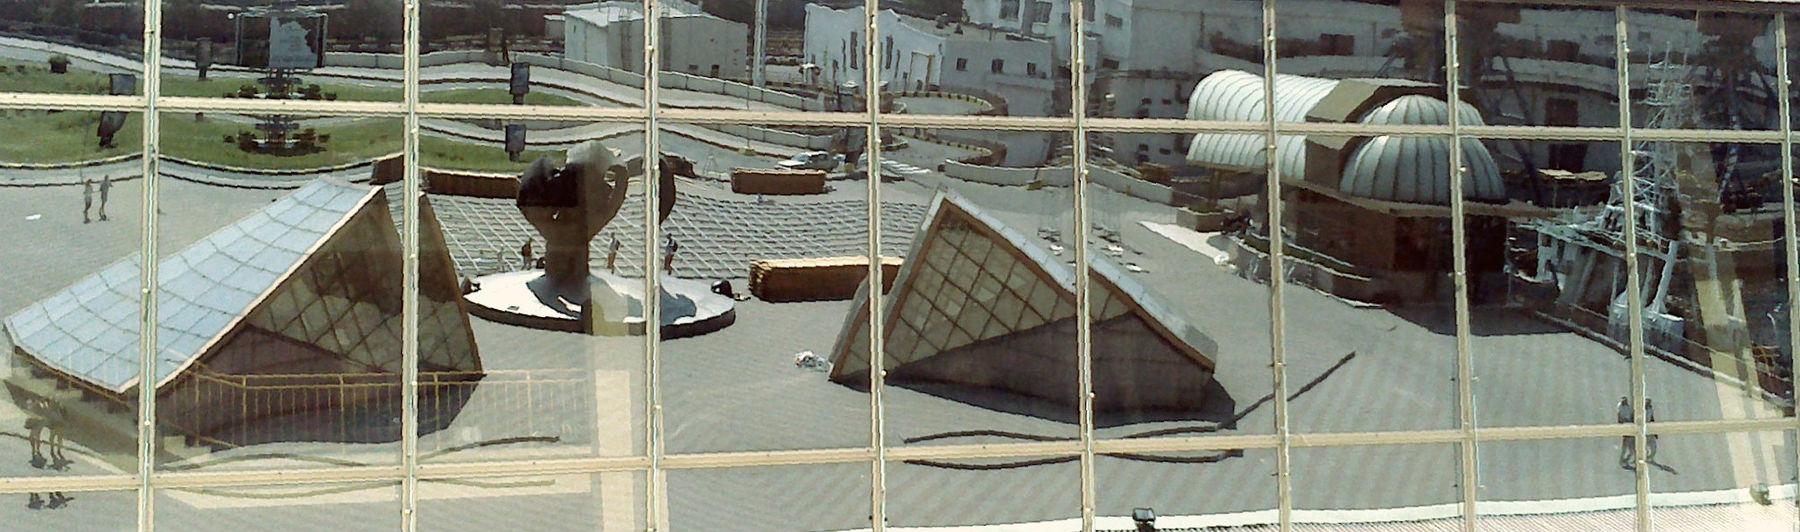 Urban Geometry City View  Selfie Time